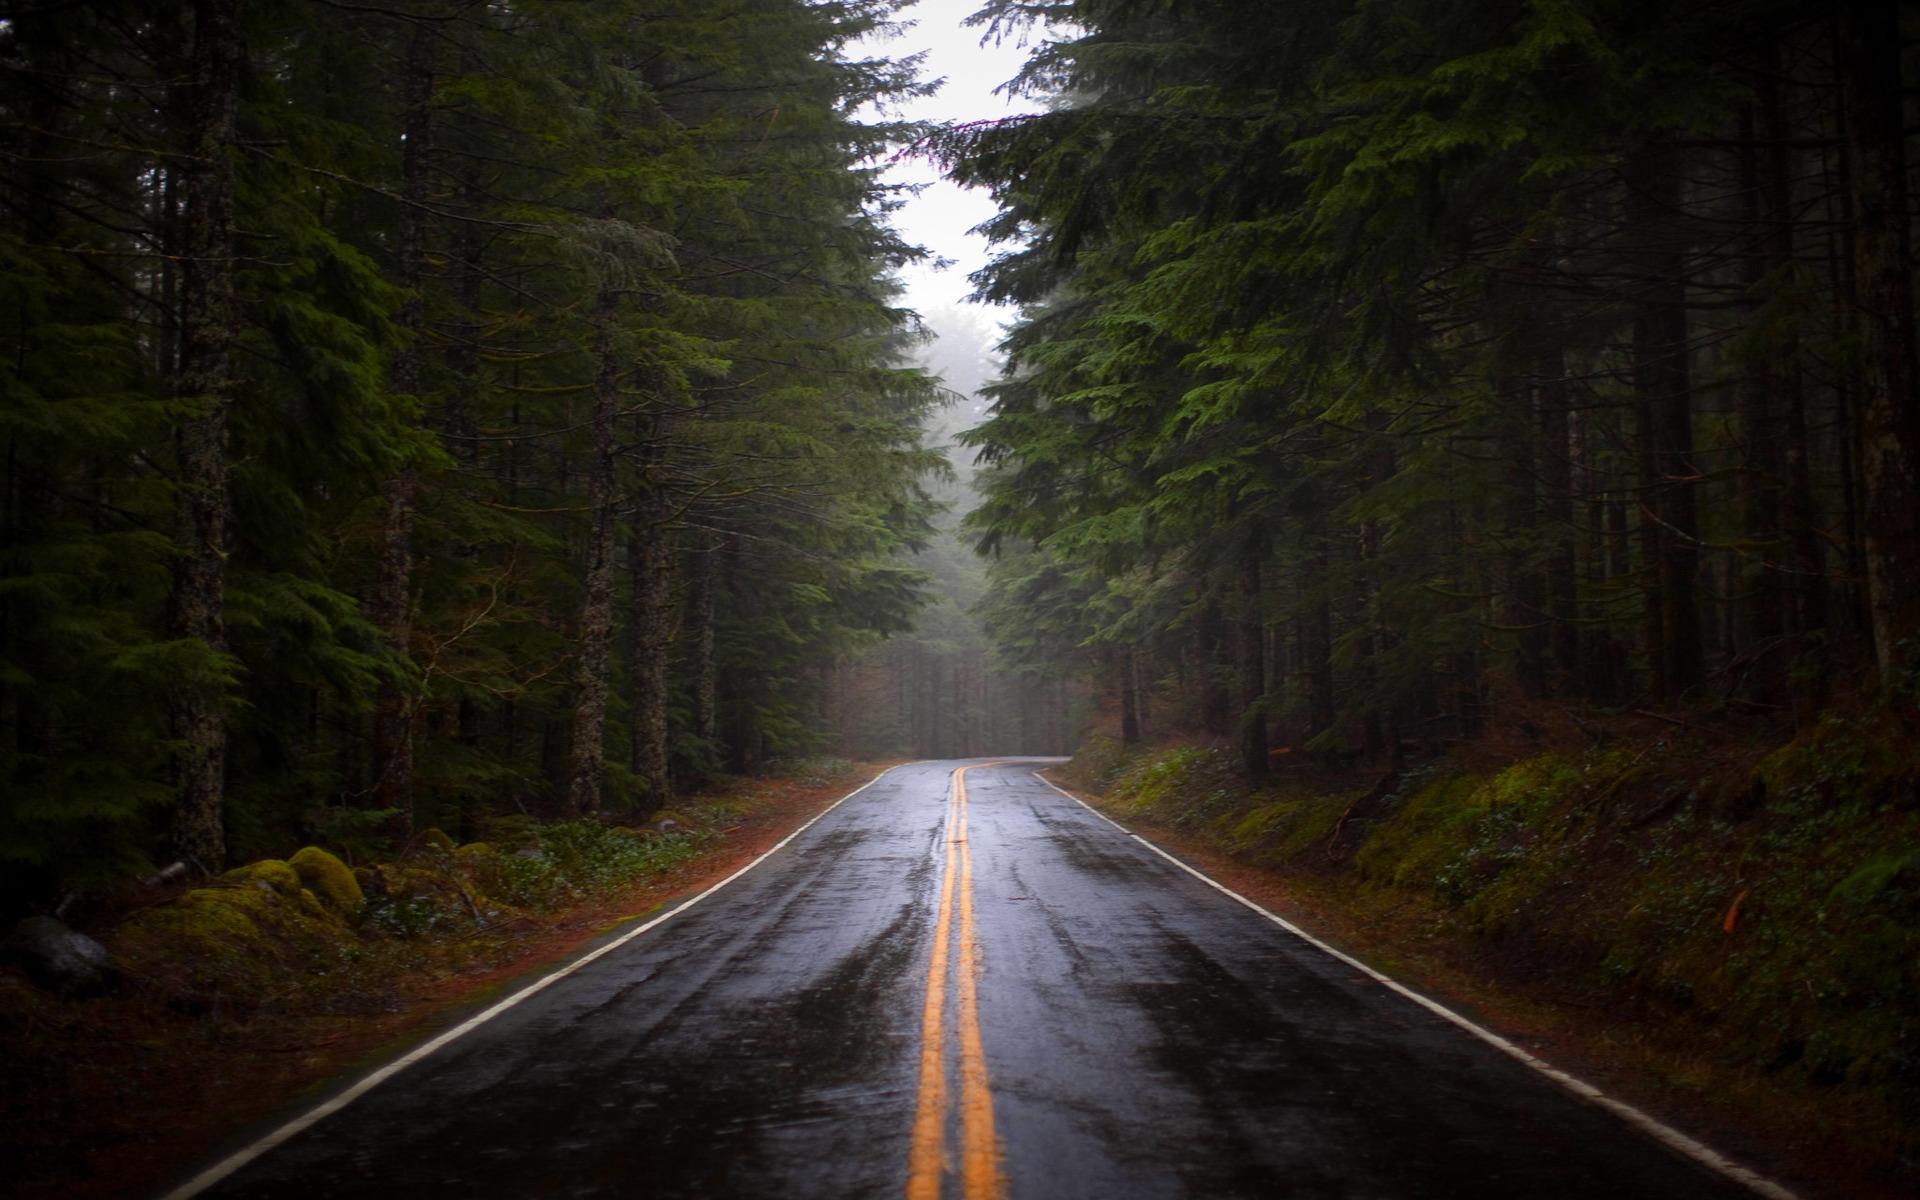 Rainy Fall Day Wallpaper Foggy Forest Backgrounds Free Download Pixelstalk Net